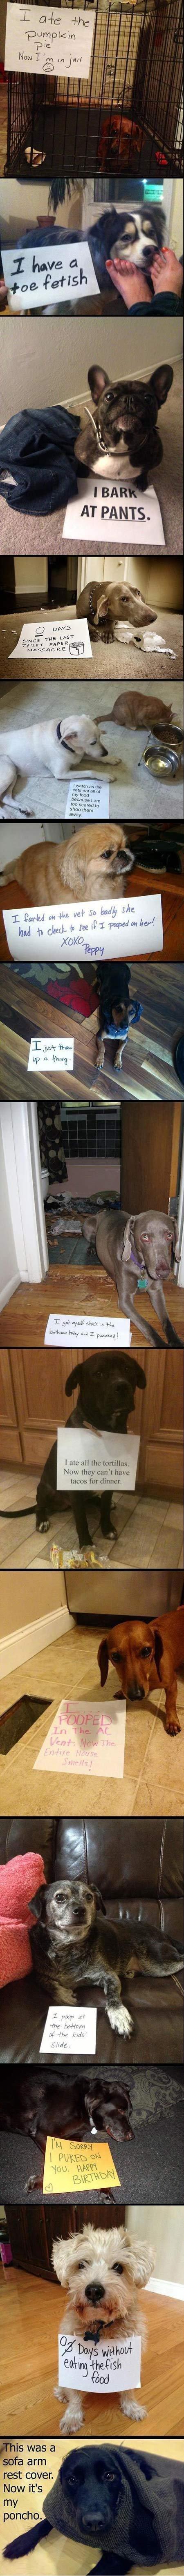 best of dog shaming. . ff; PASTE Mit may MM hau- lawns for dinner. brg 'um taist'. I giggled.